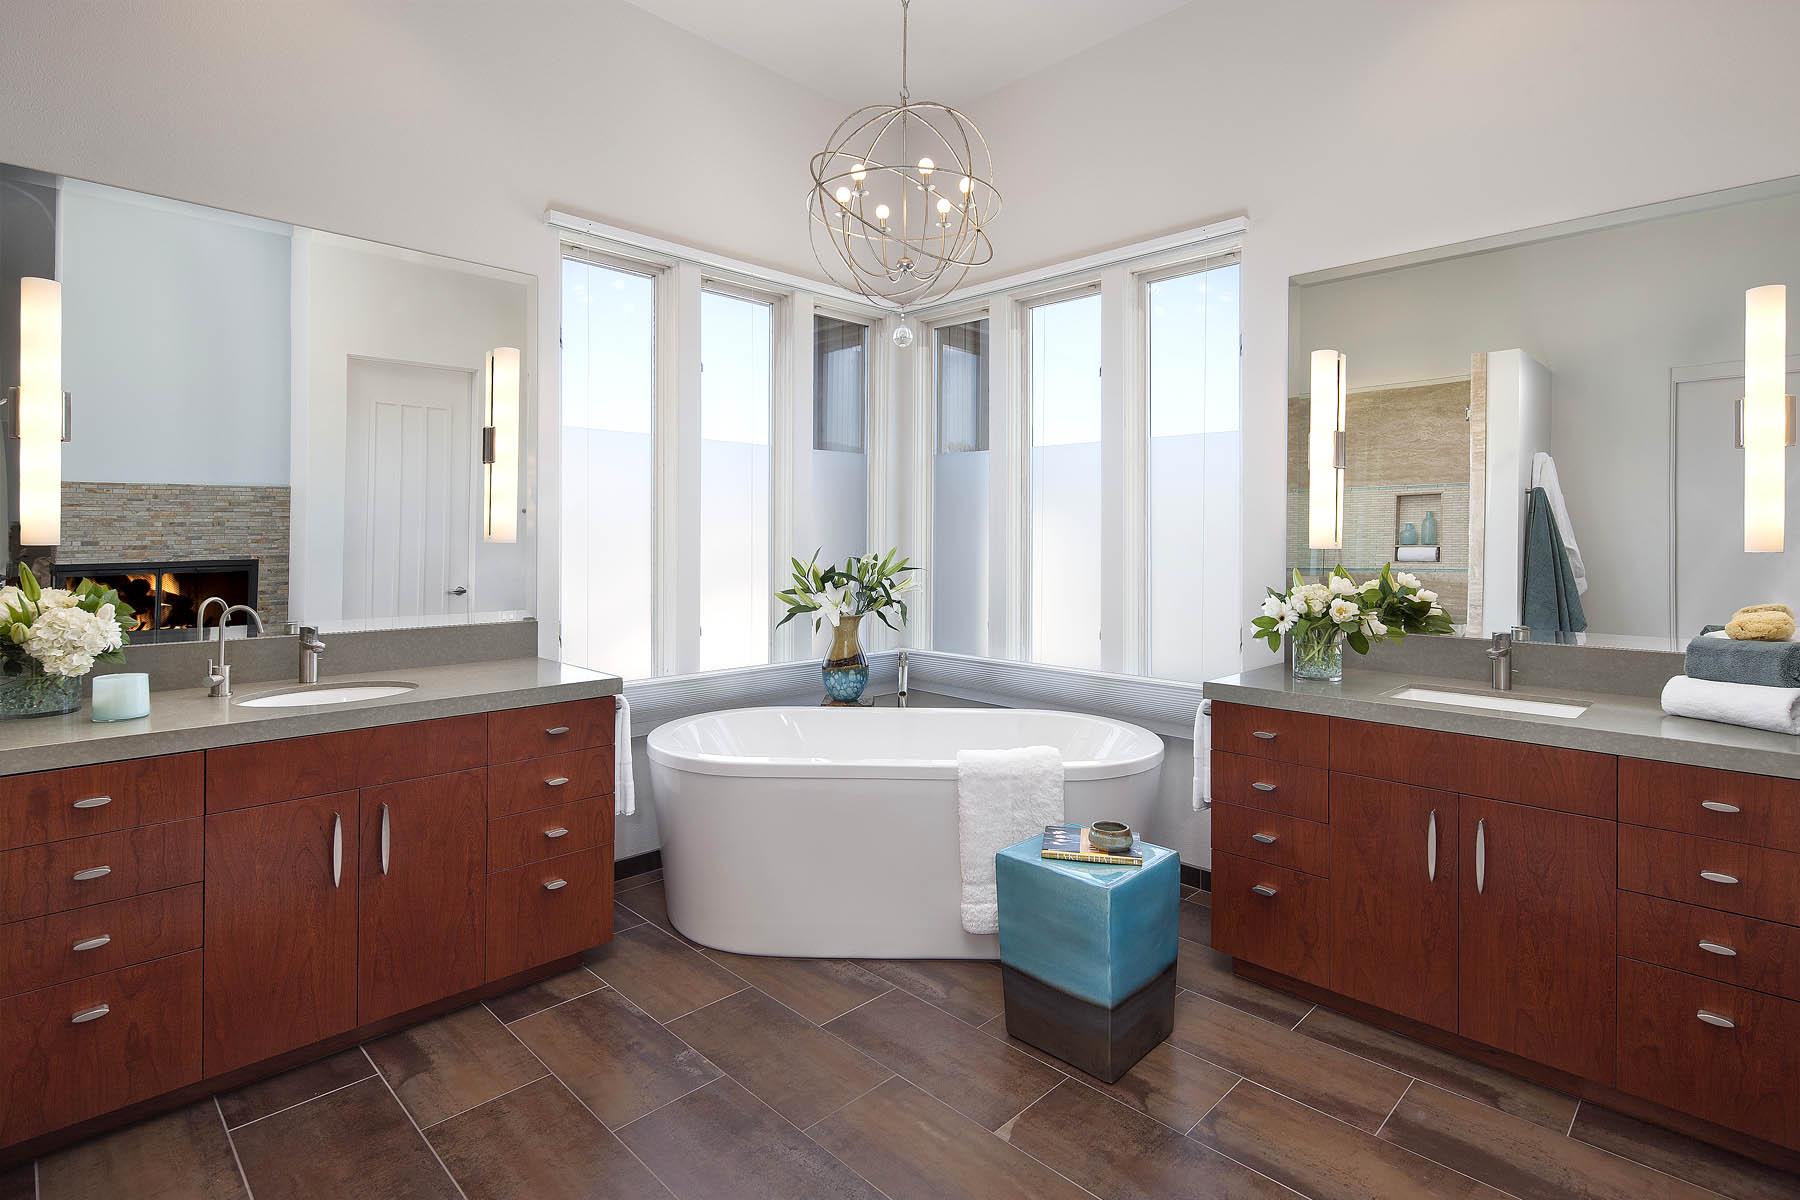 Robillard bathroom